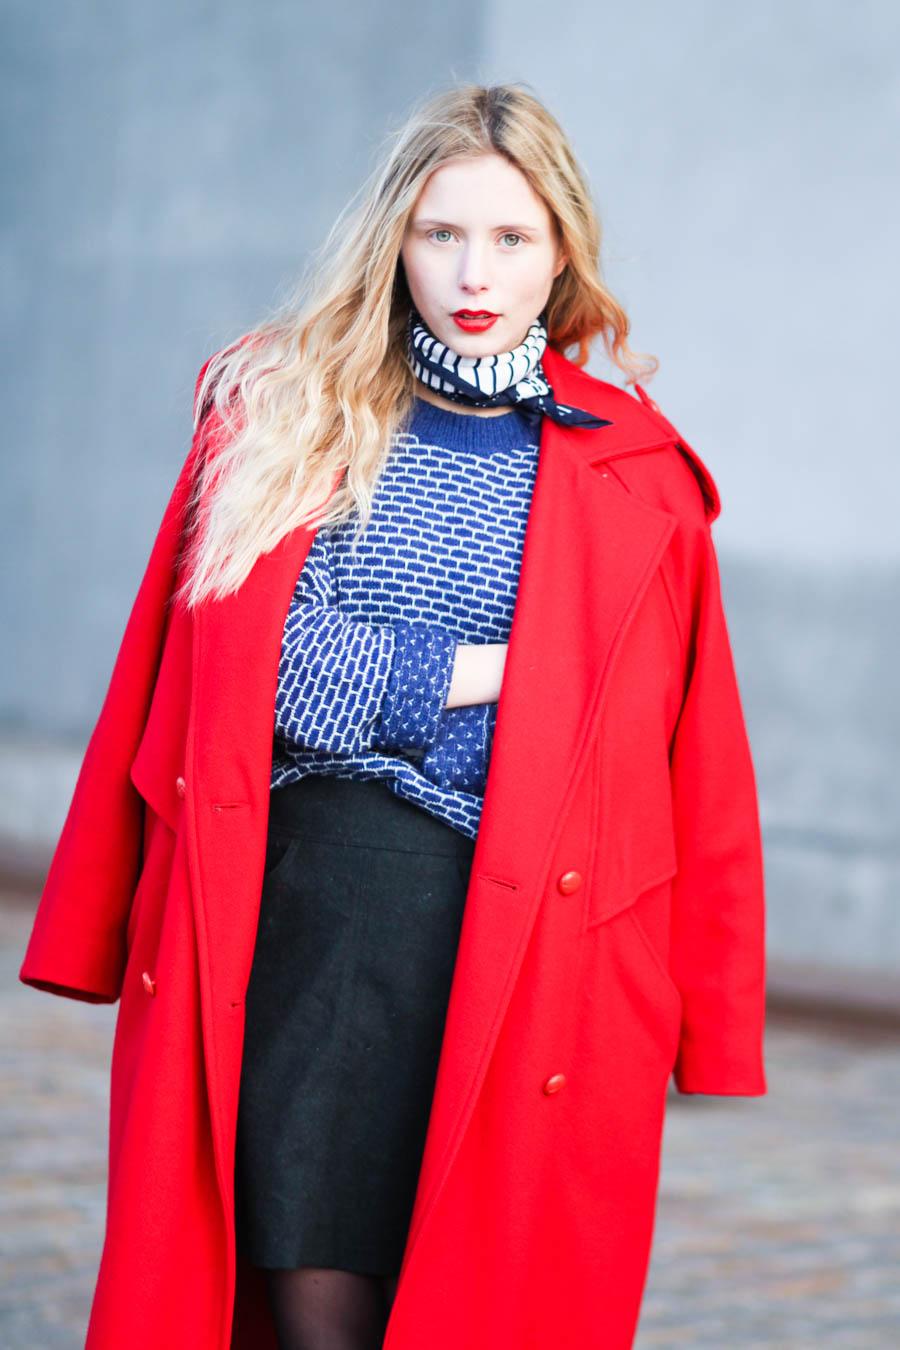 outfit January nemesis babe marie jensen danish blogger -5